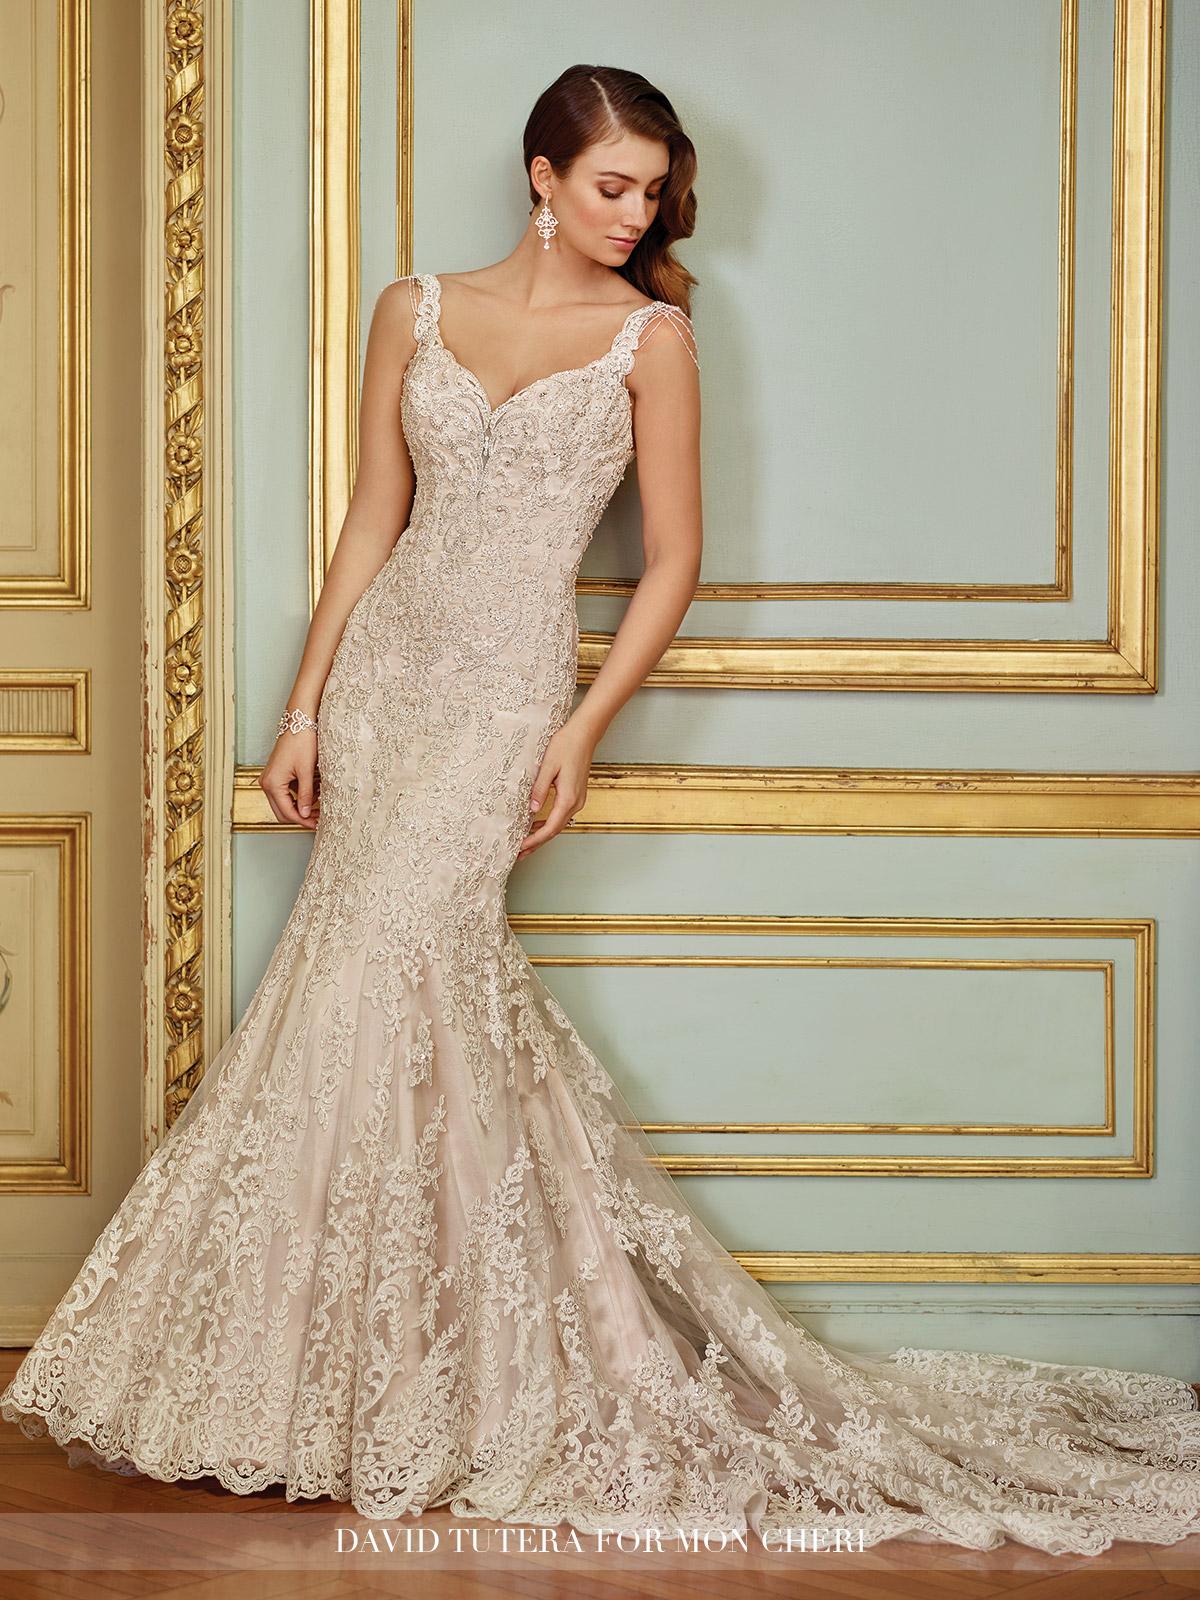 Wedding Dress Hire Uk Prices - Data Dynamic